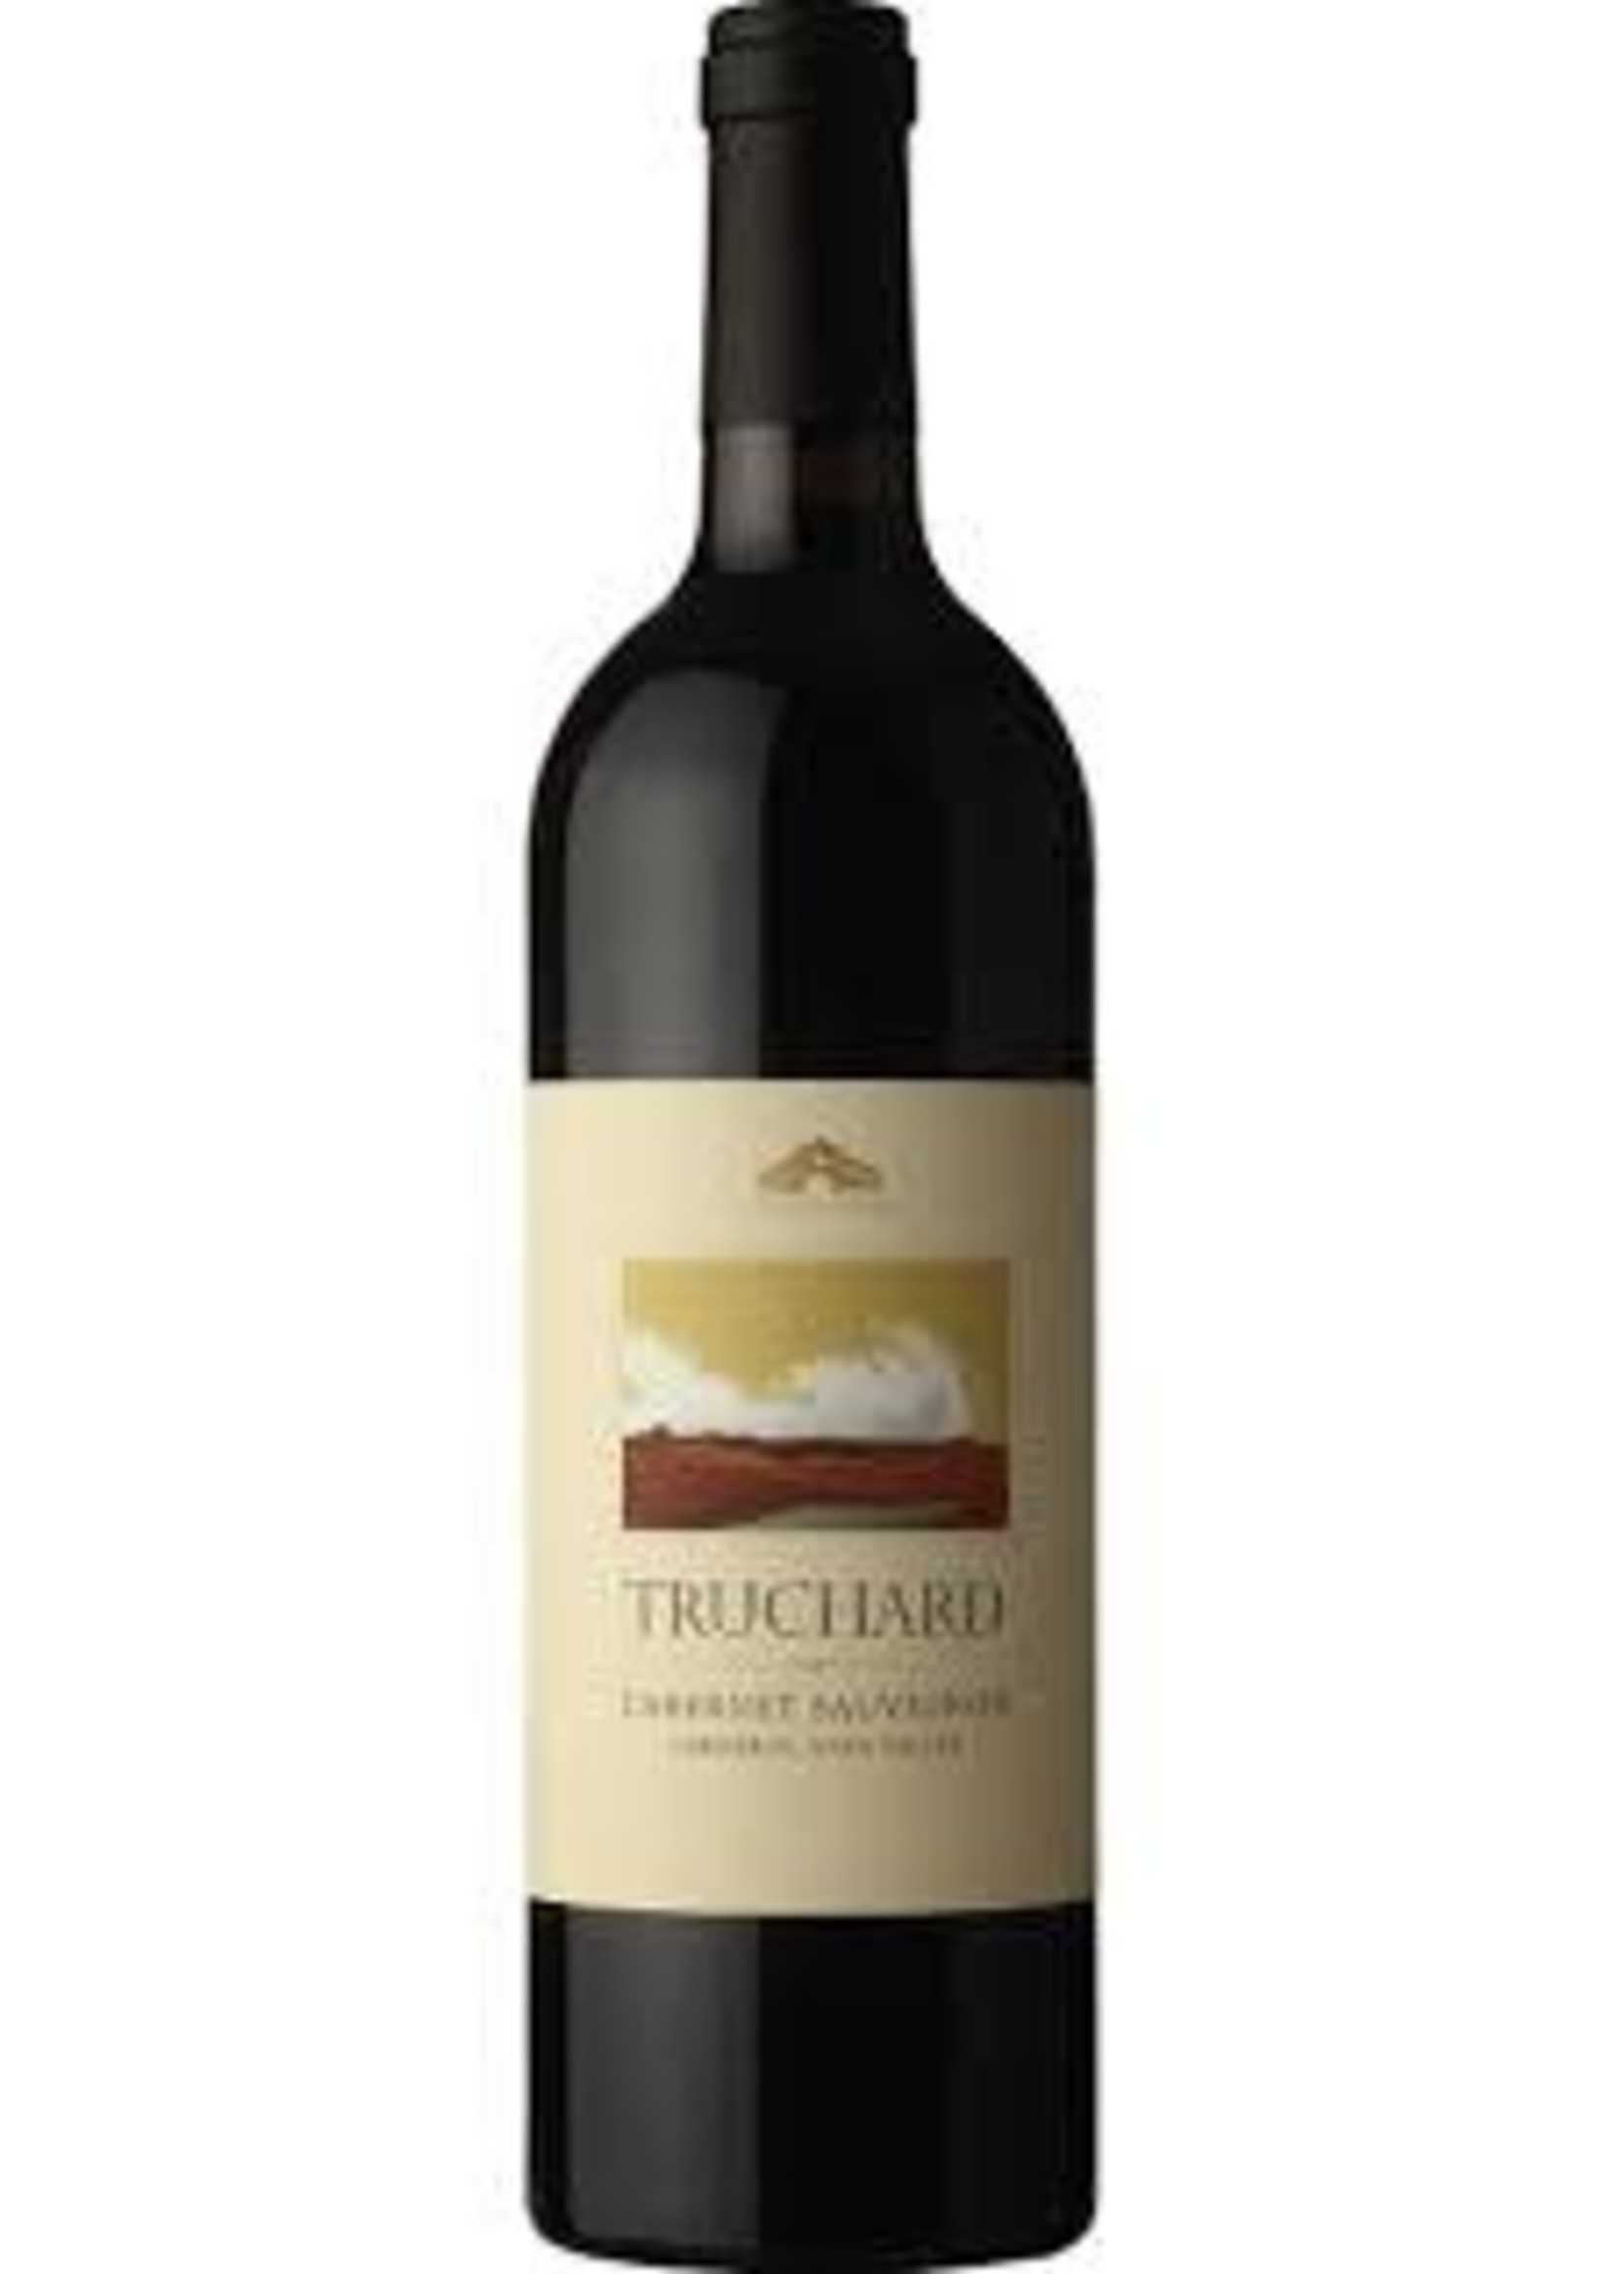 Truchard 2017 Cabernet Sauvignon Napa 750ml